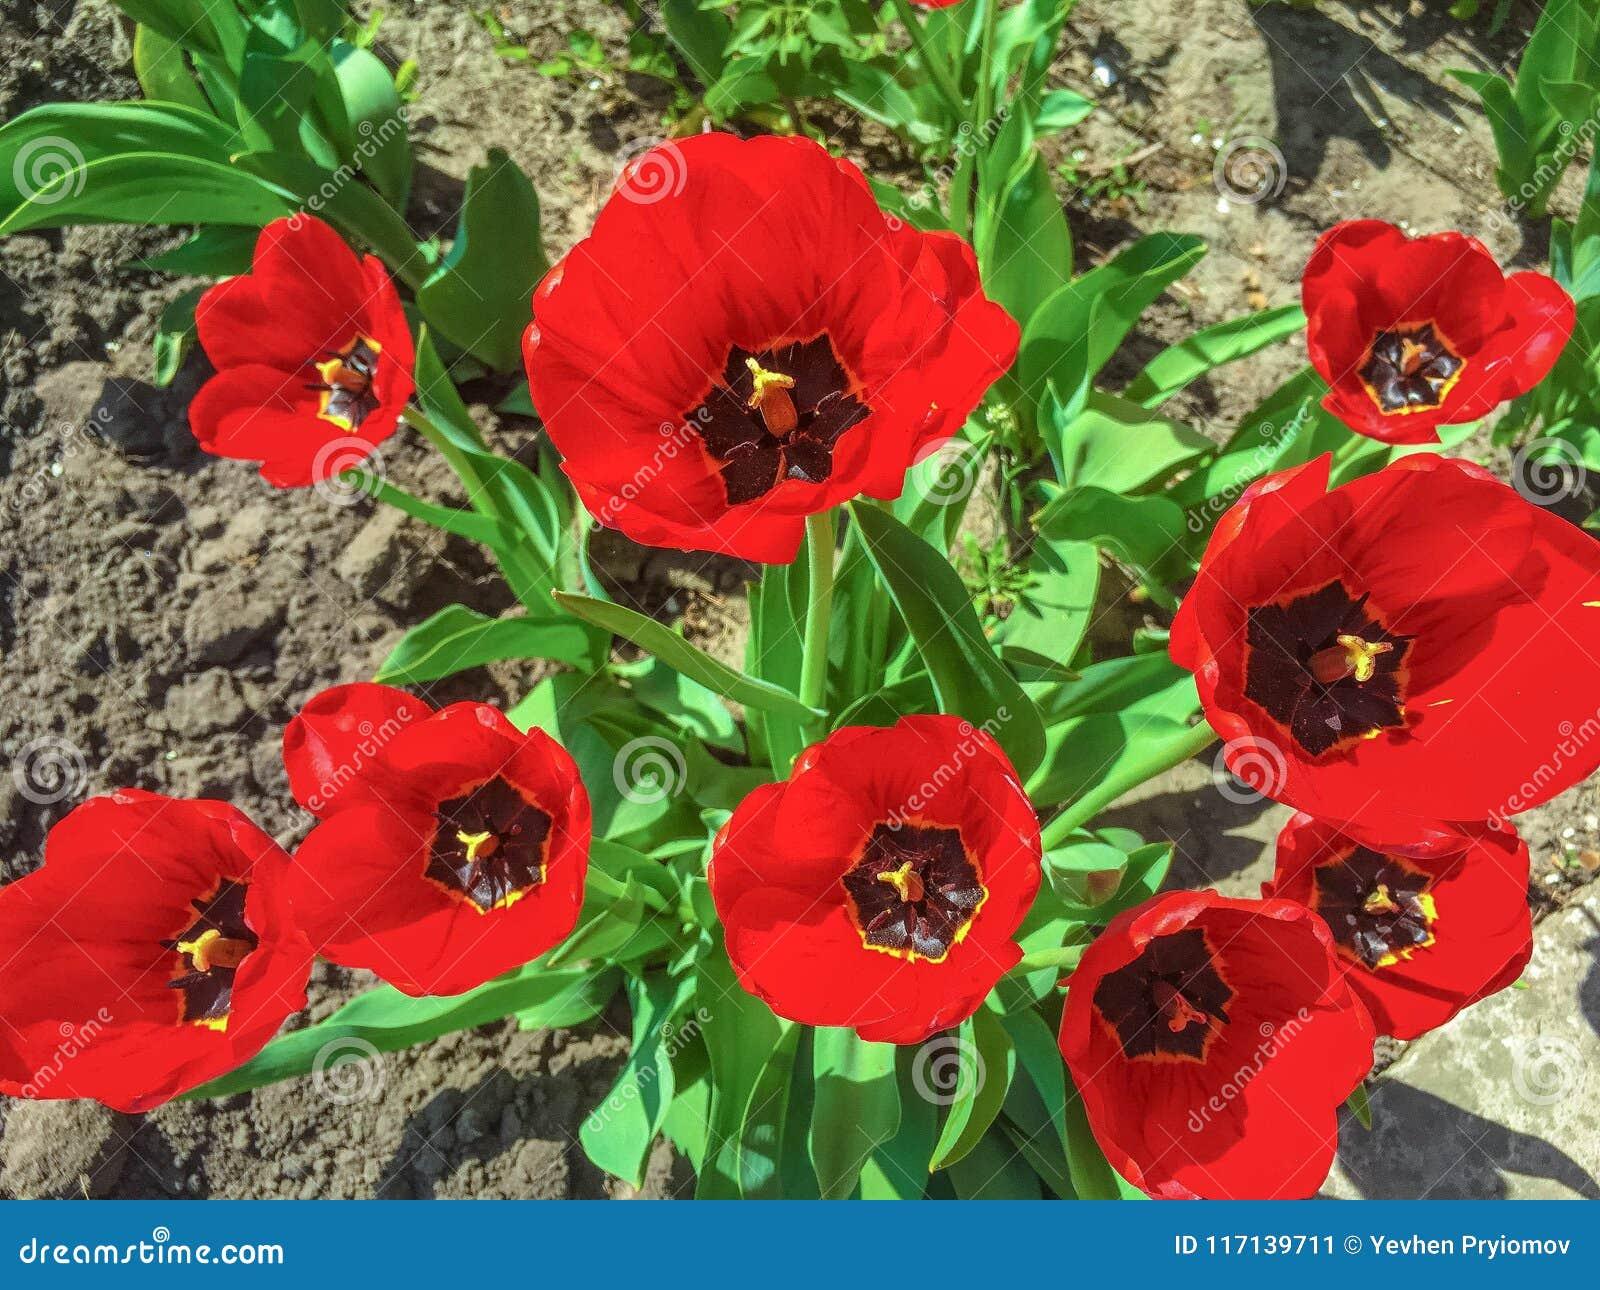 Beautiful Poppy Flowers In The Garden Stock Image Image Of Poppy